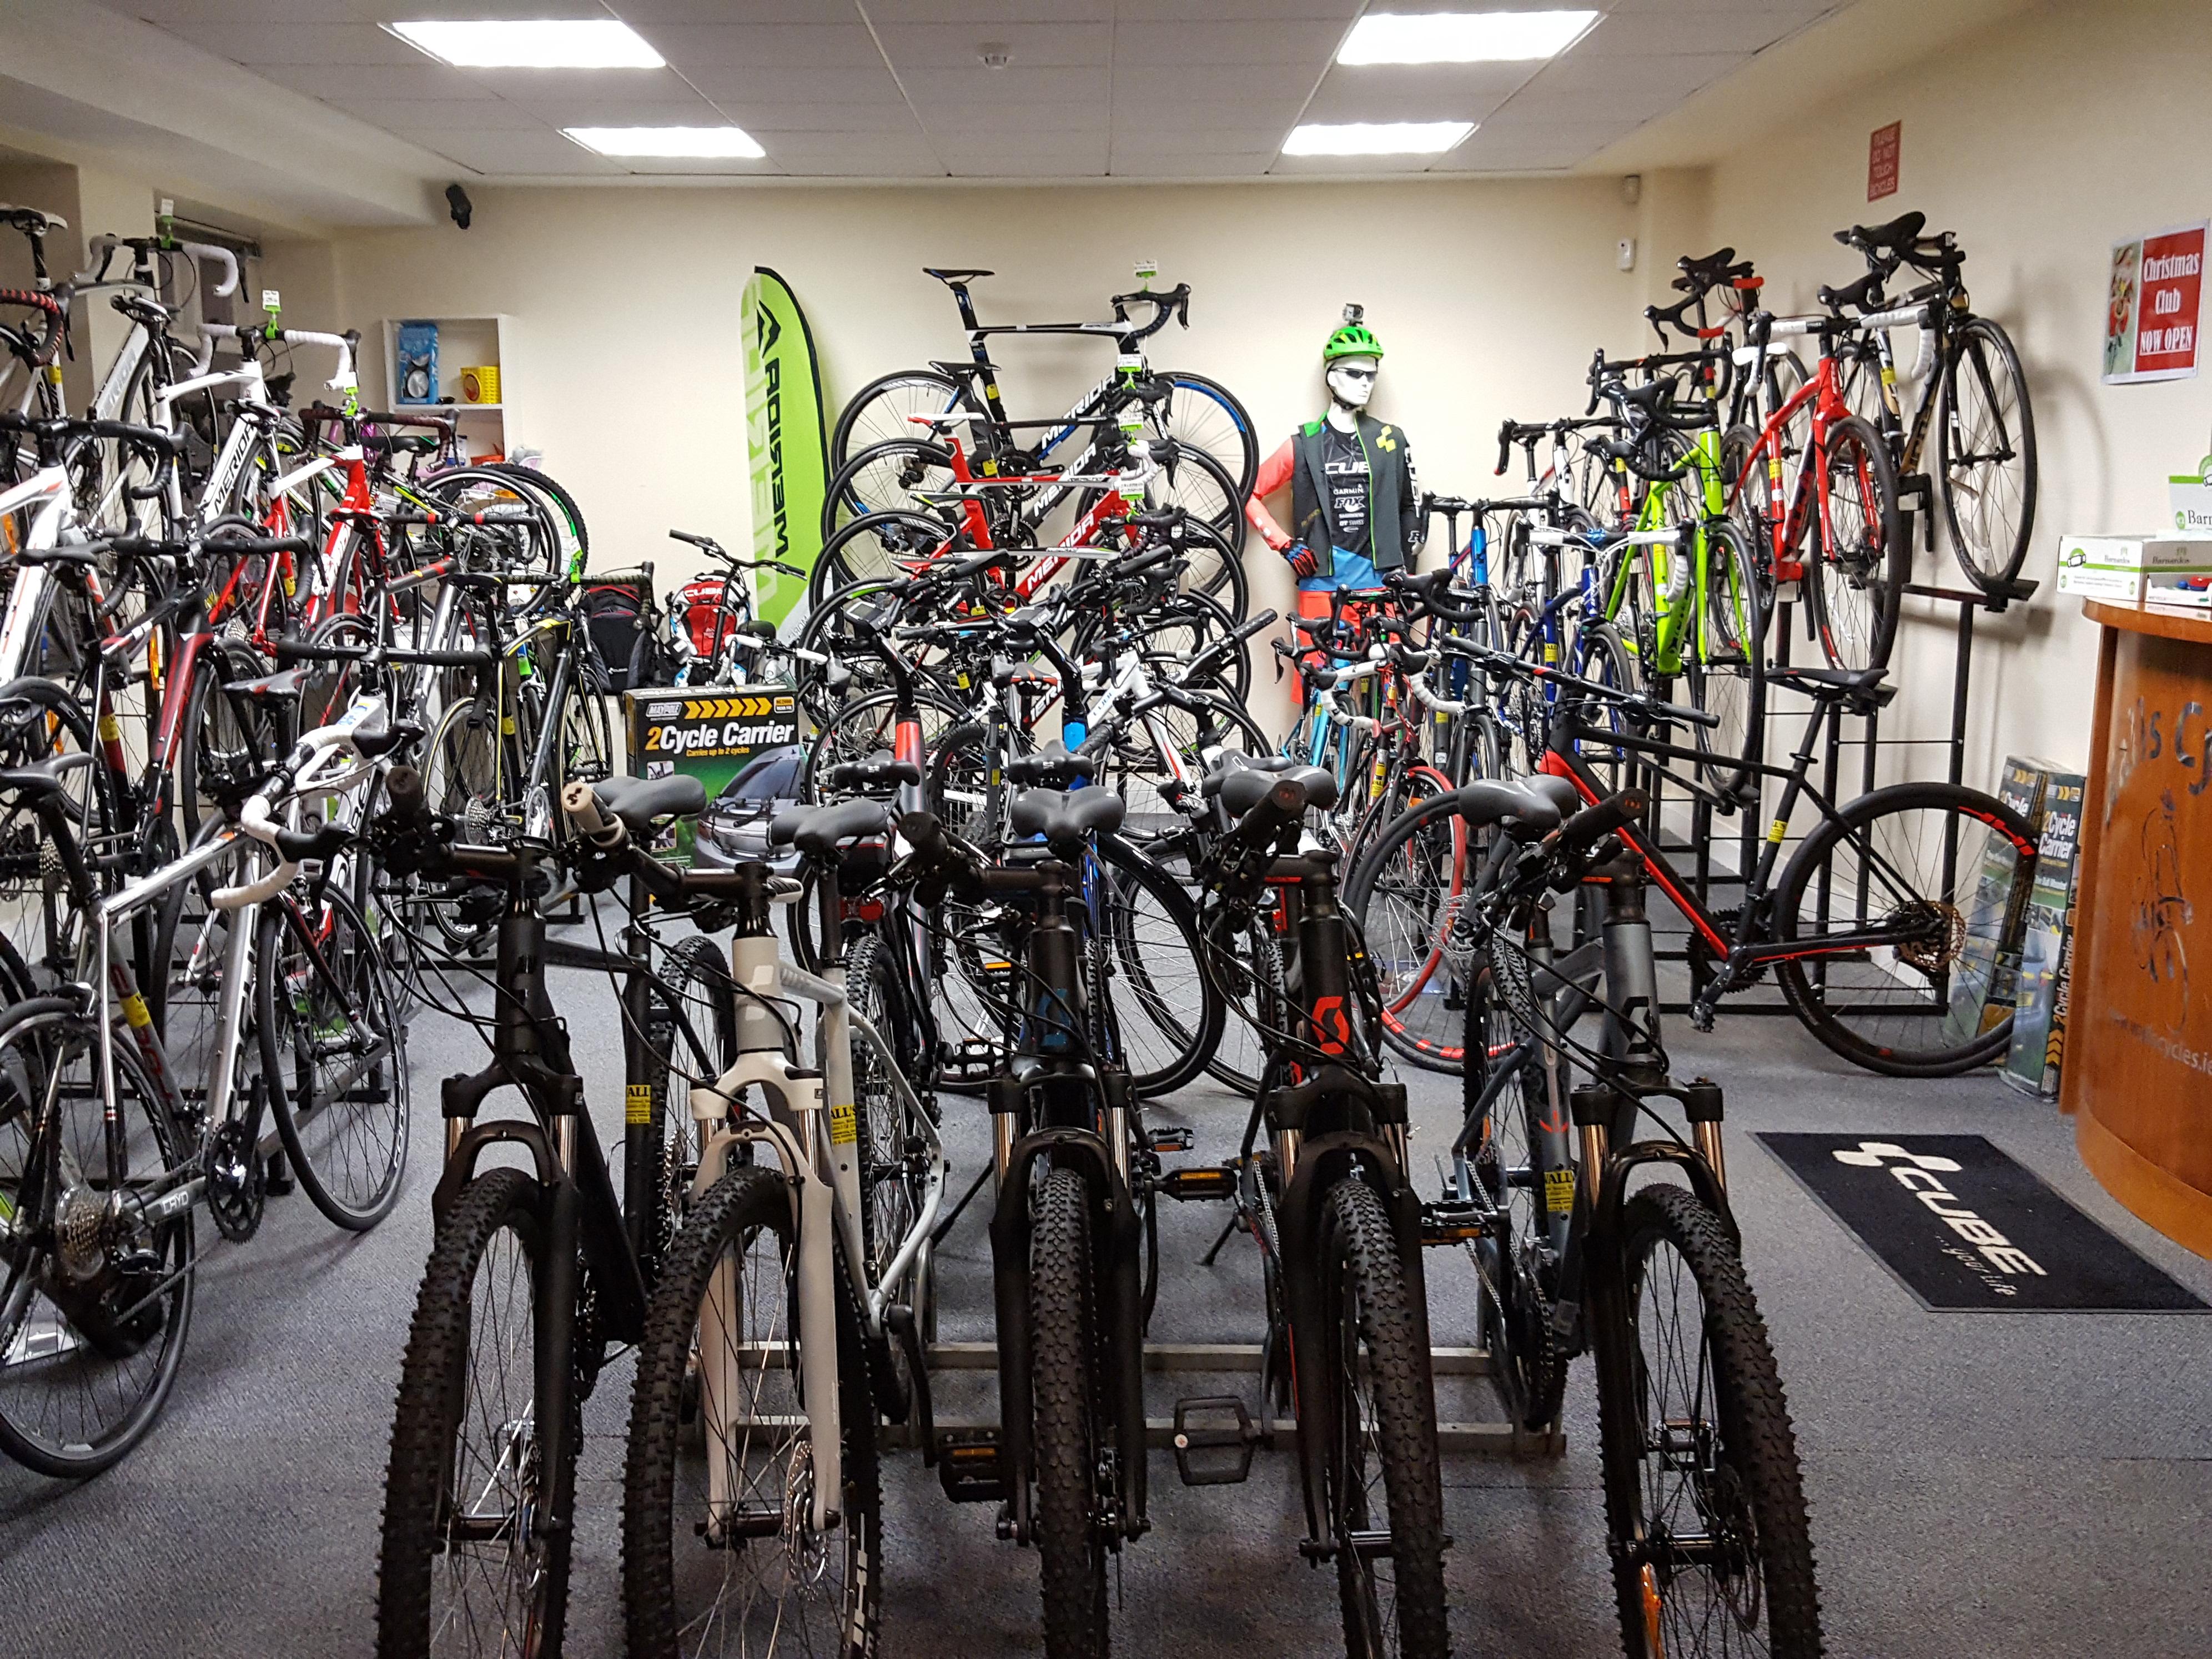 Center bikes all